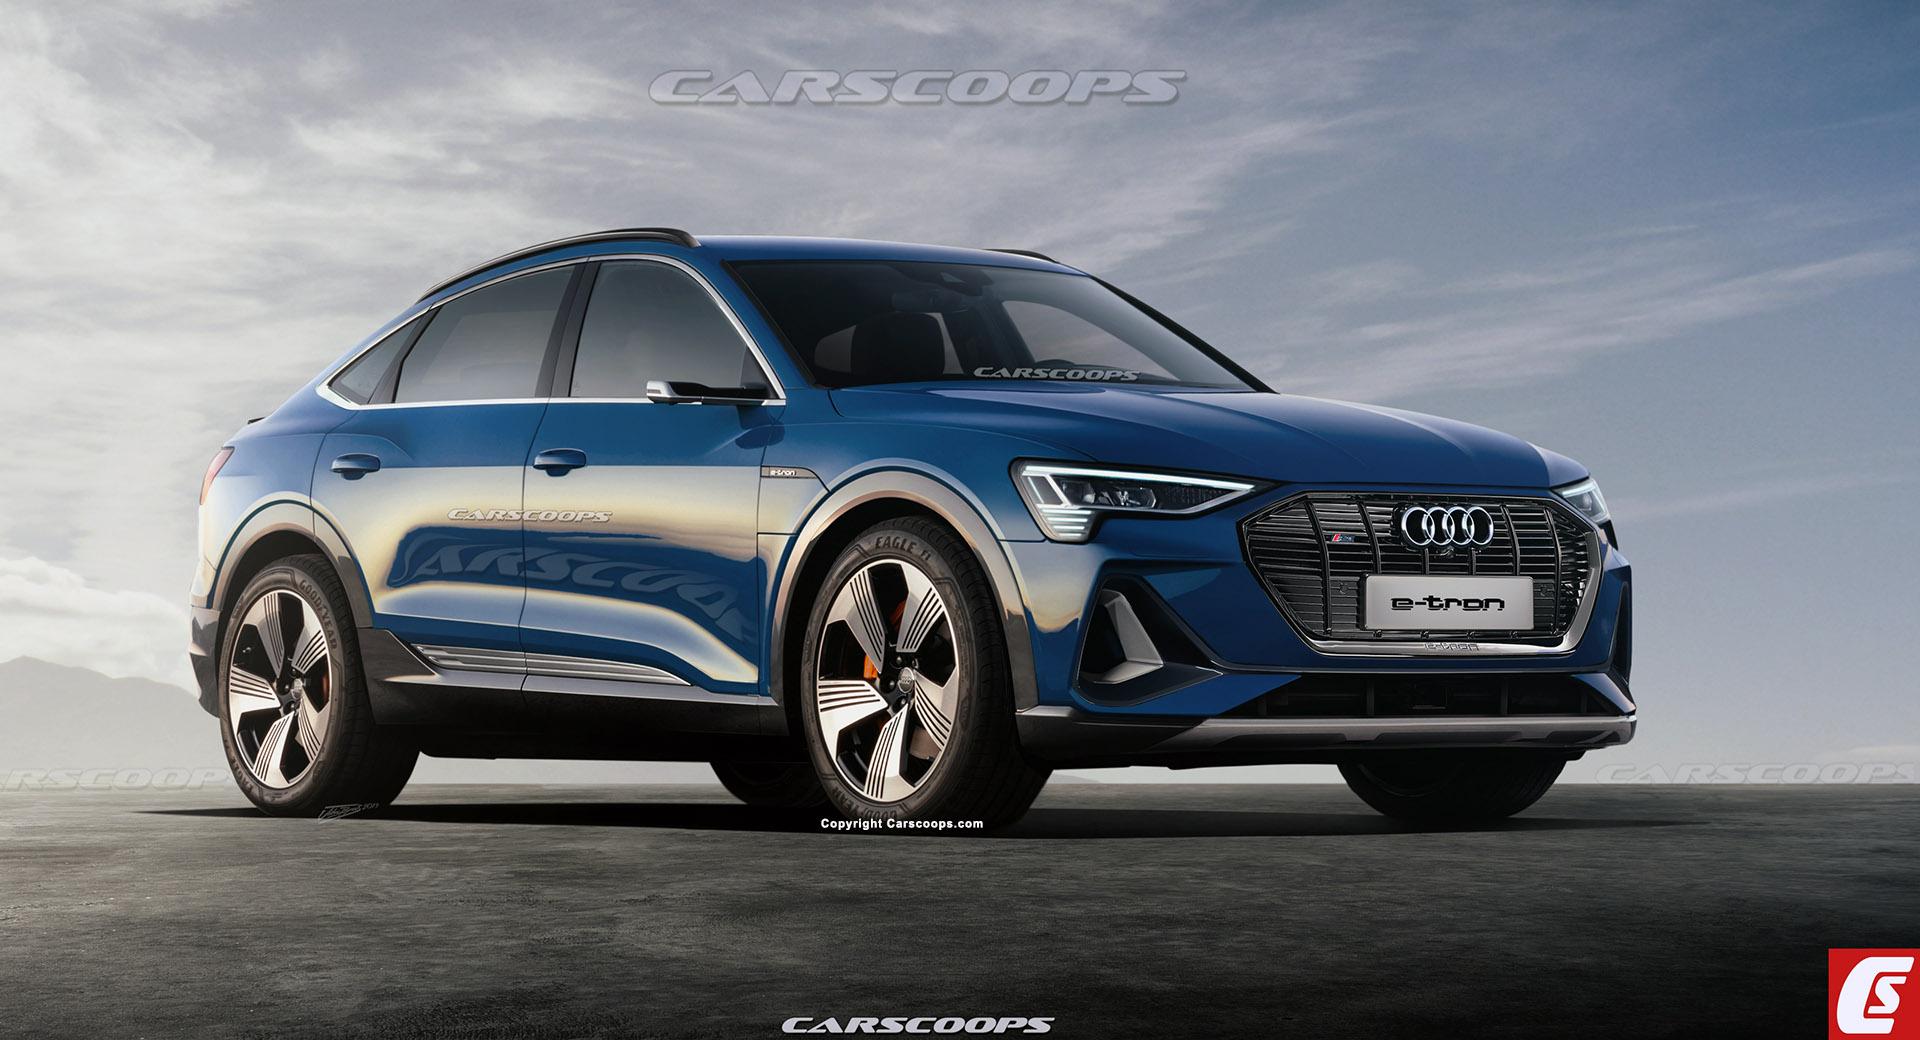 2020 - [Audi] E-Tron Sportback - Page 2 8ad6e87d-2020-audi-e-tron-sportback-carscoops-com